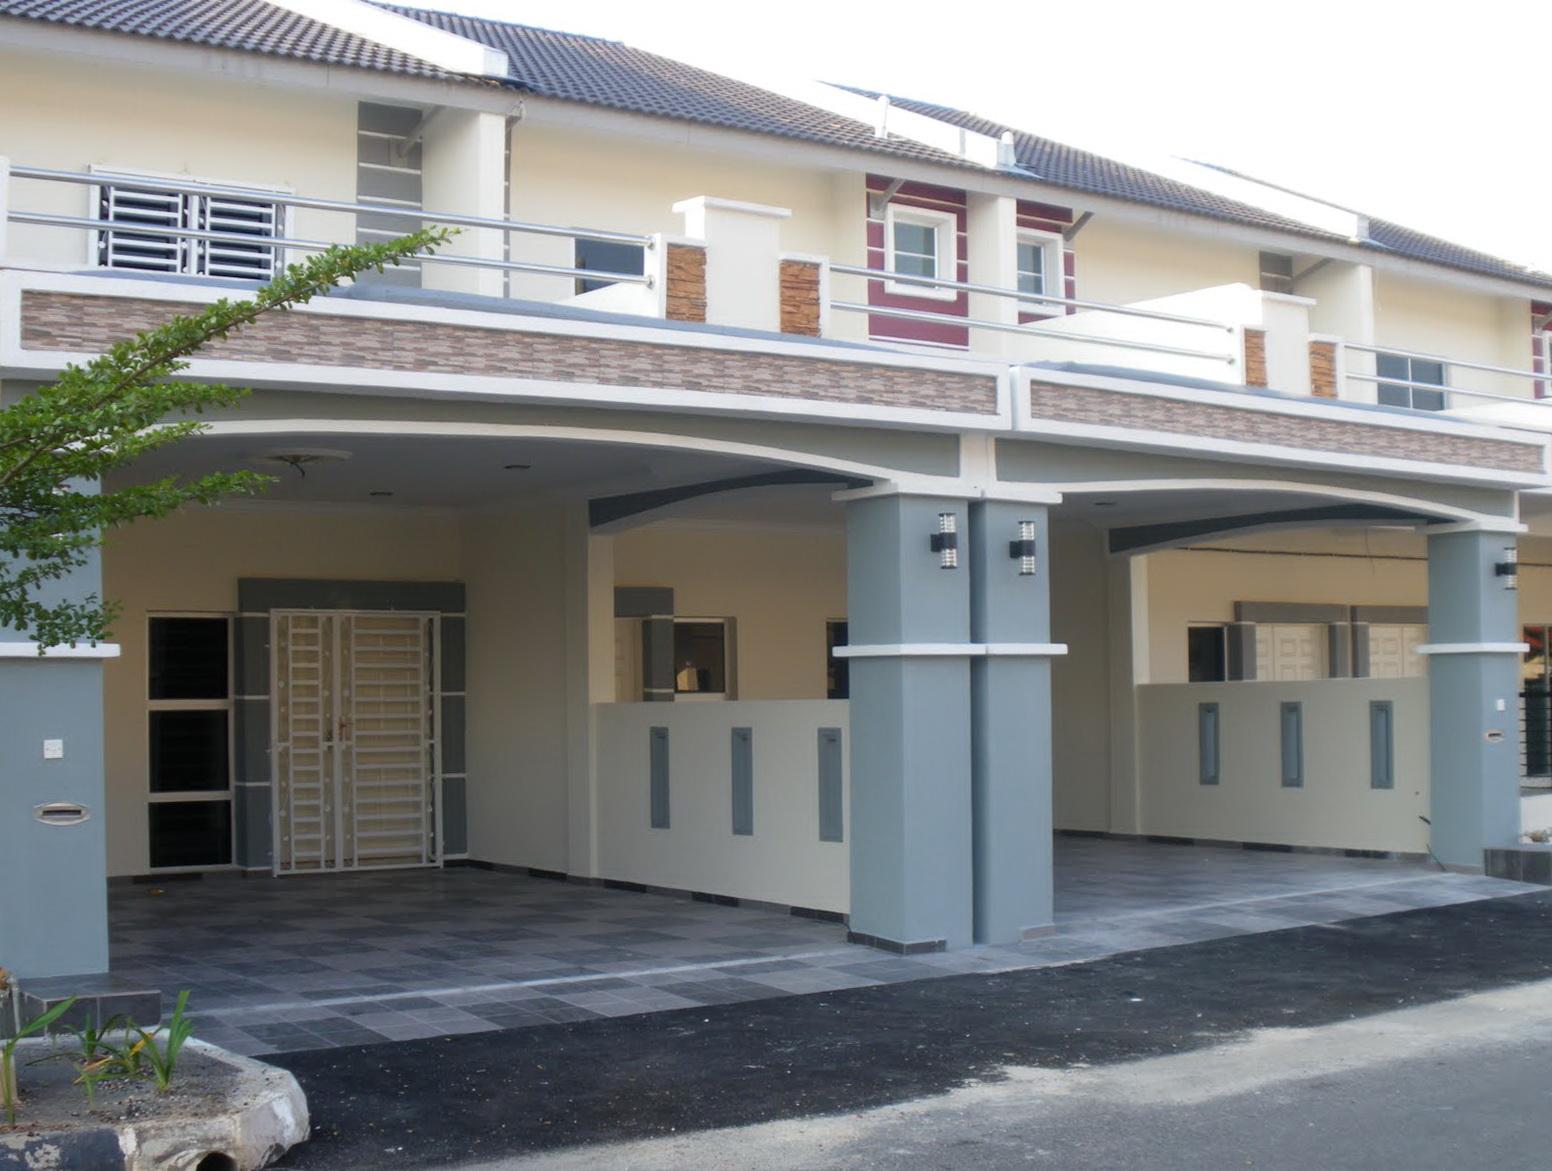 Naluri Kehidupanku: Rumah : Idea of Car Porch Roof Design